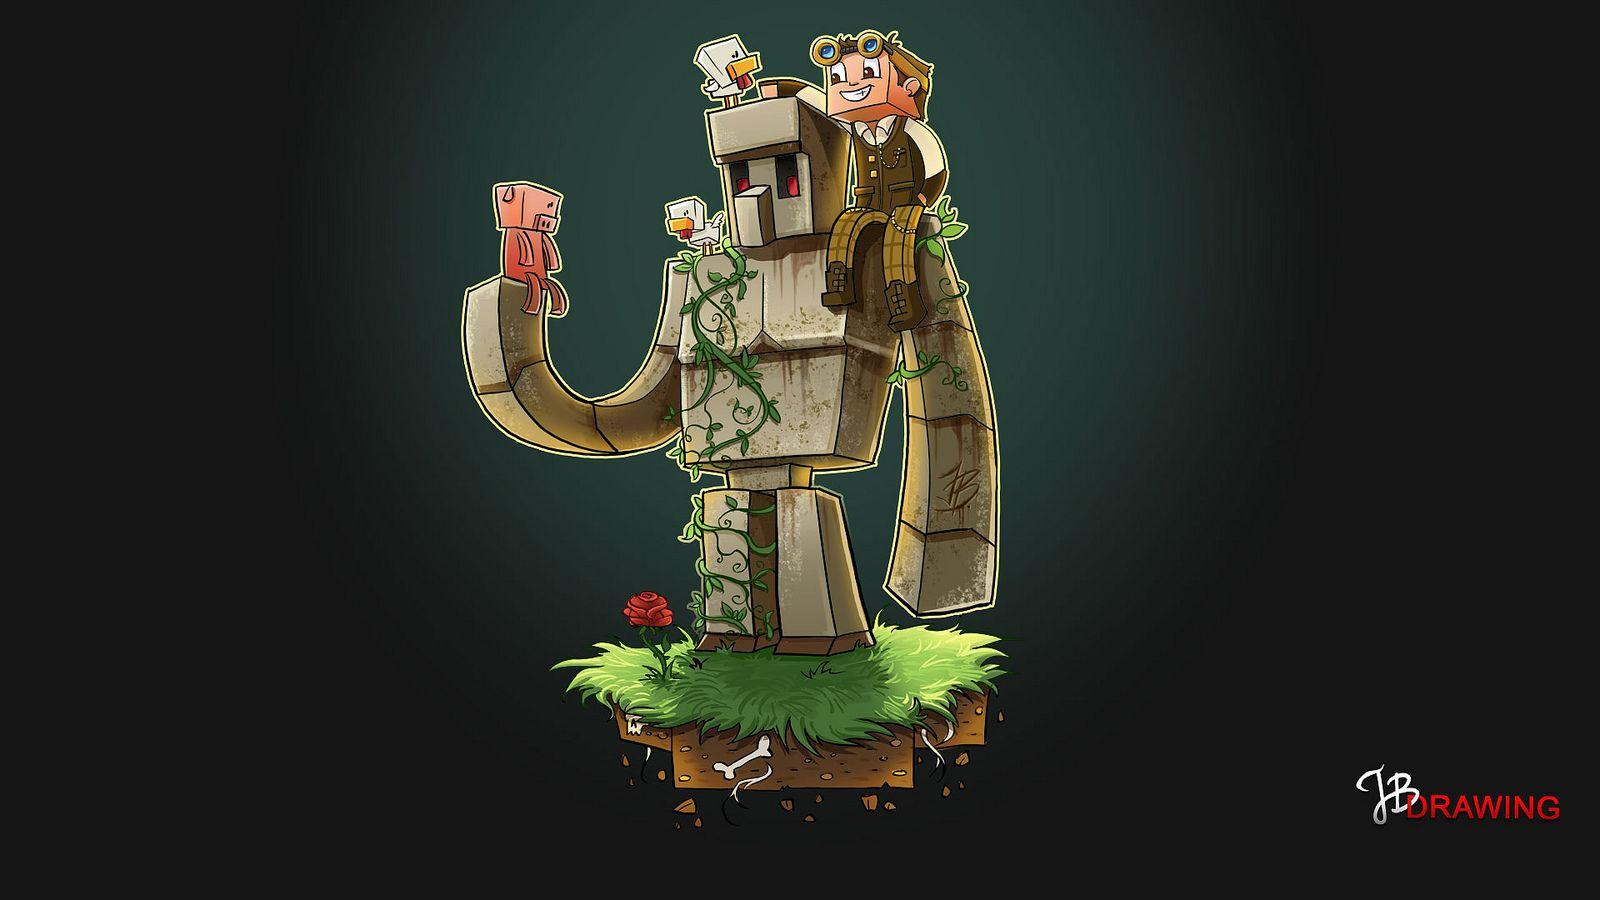 Most Inspiring Wallpaper Minecraft Art - fe04ed7a1c84a81b05f7ac965c6f247e  Trends_85632.jpg